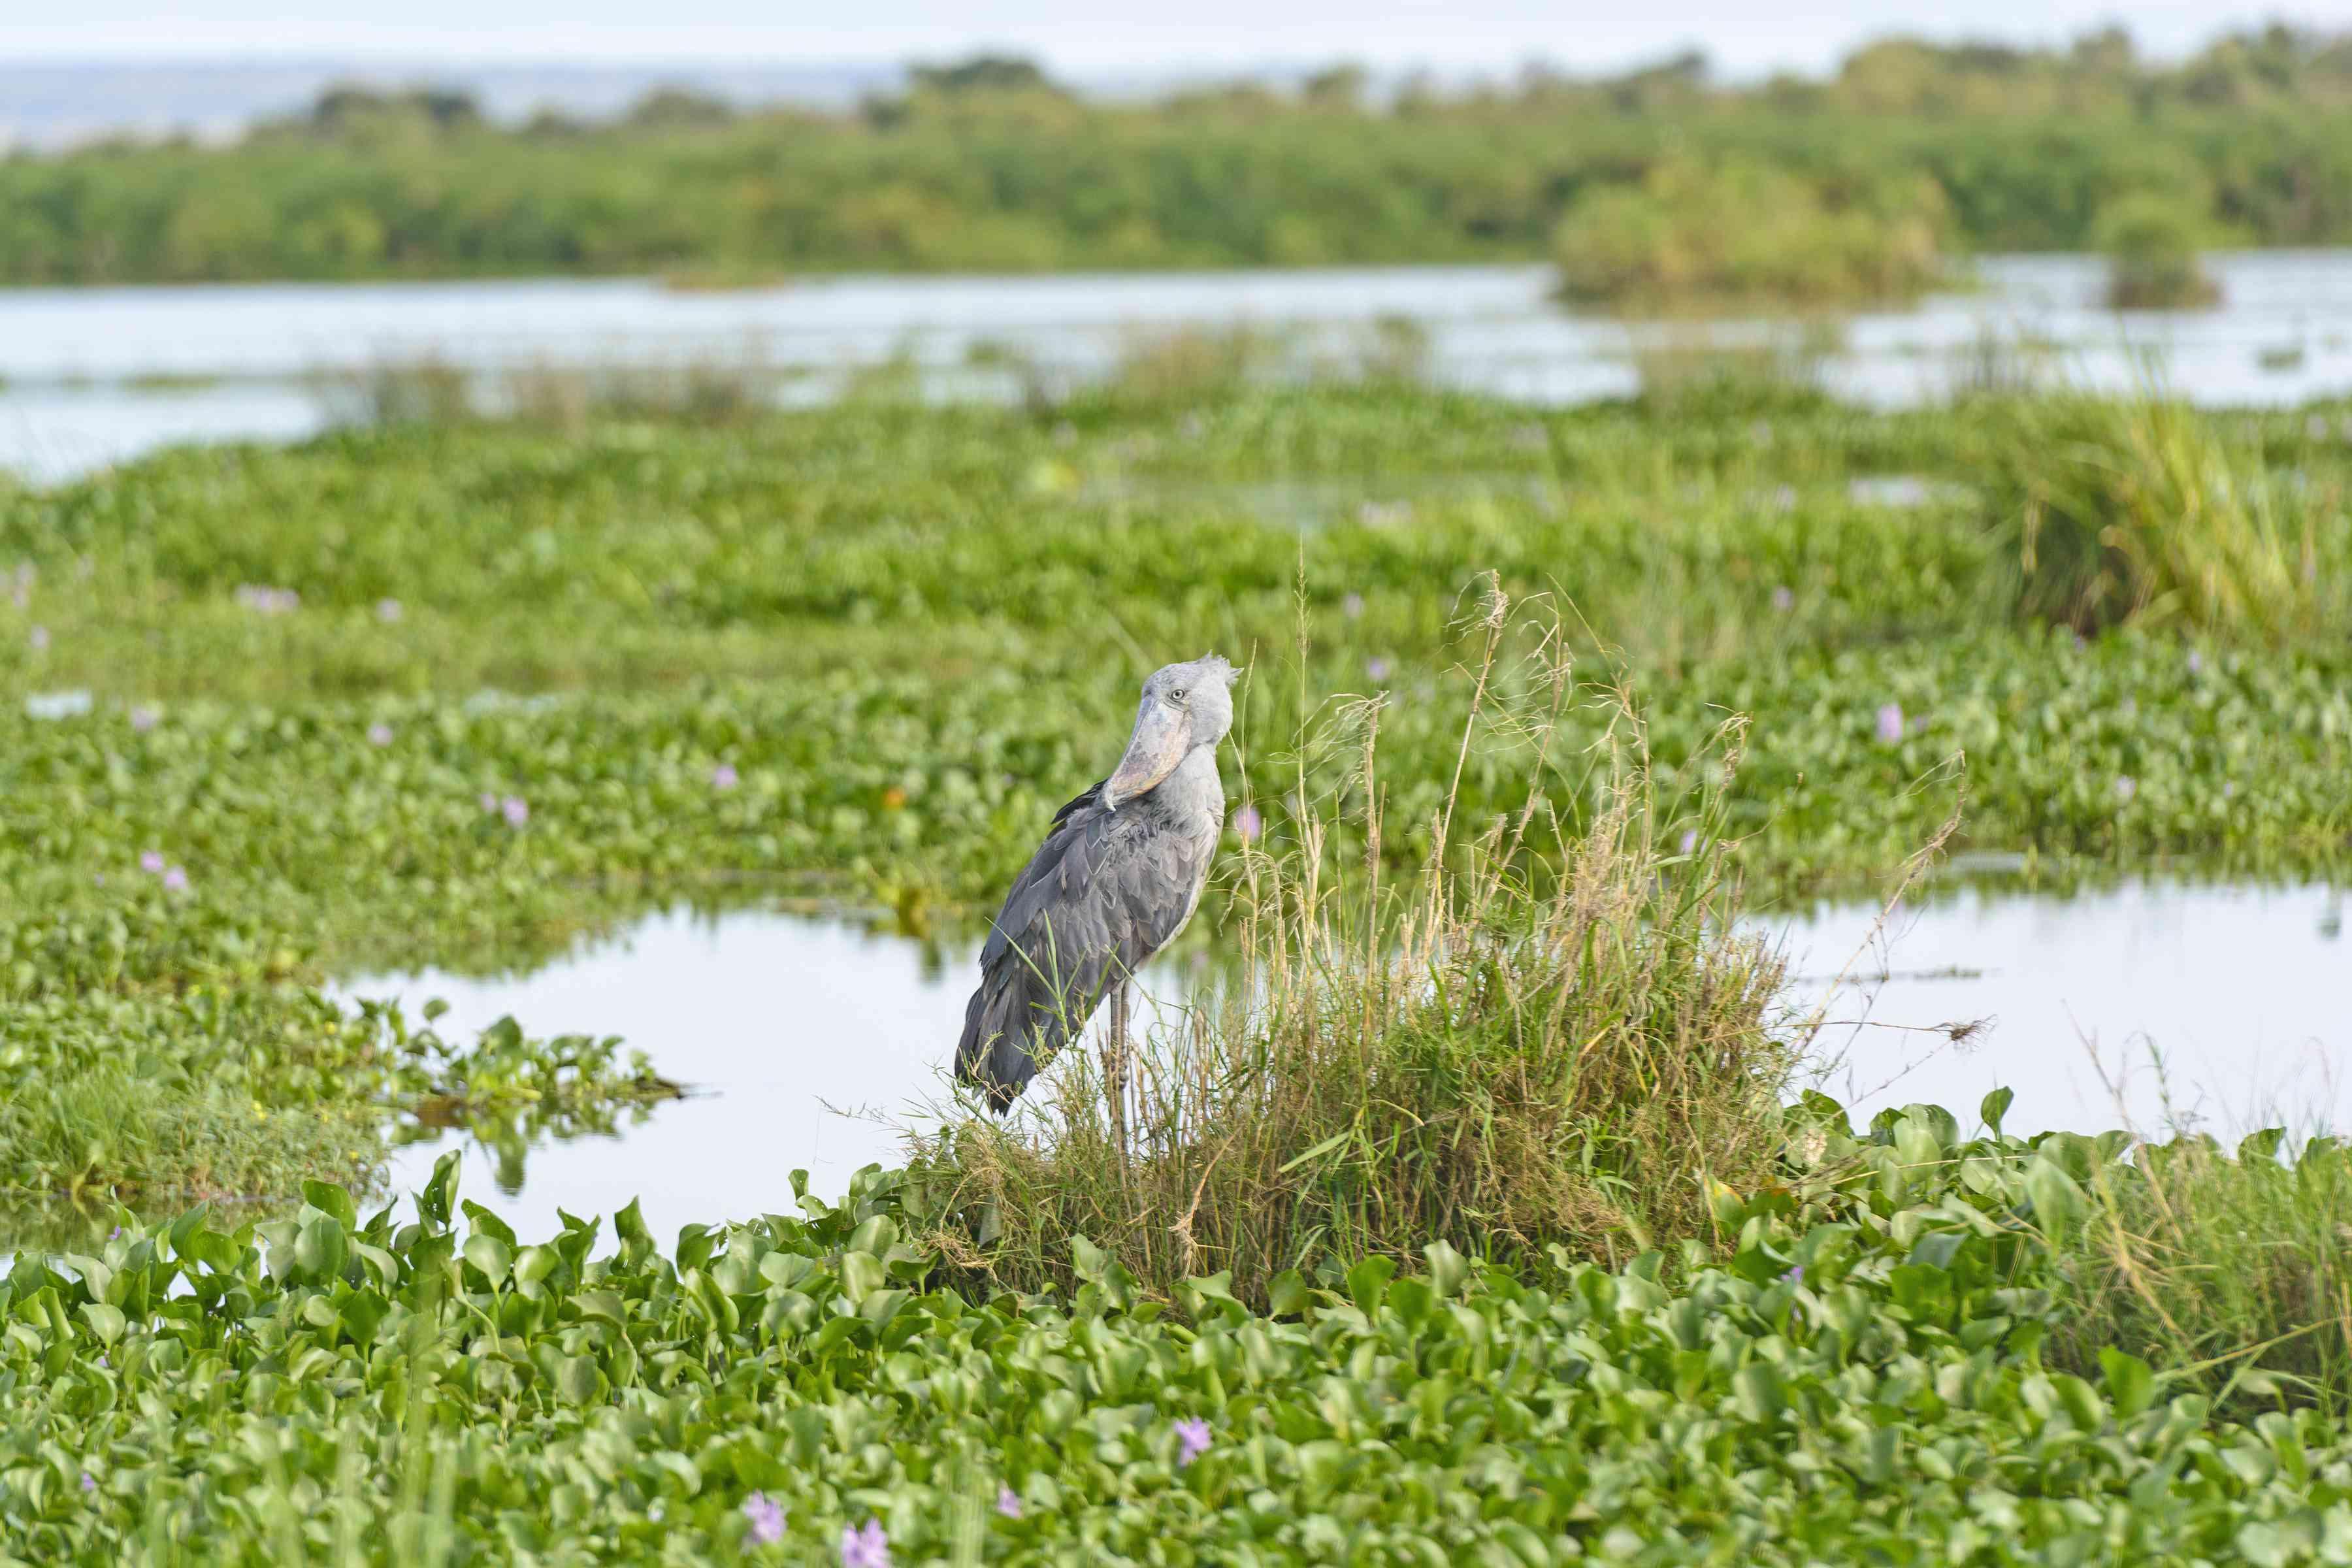 Shoebill stork in the delta swamps of Murchison Falls National Park